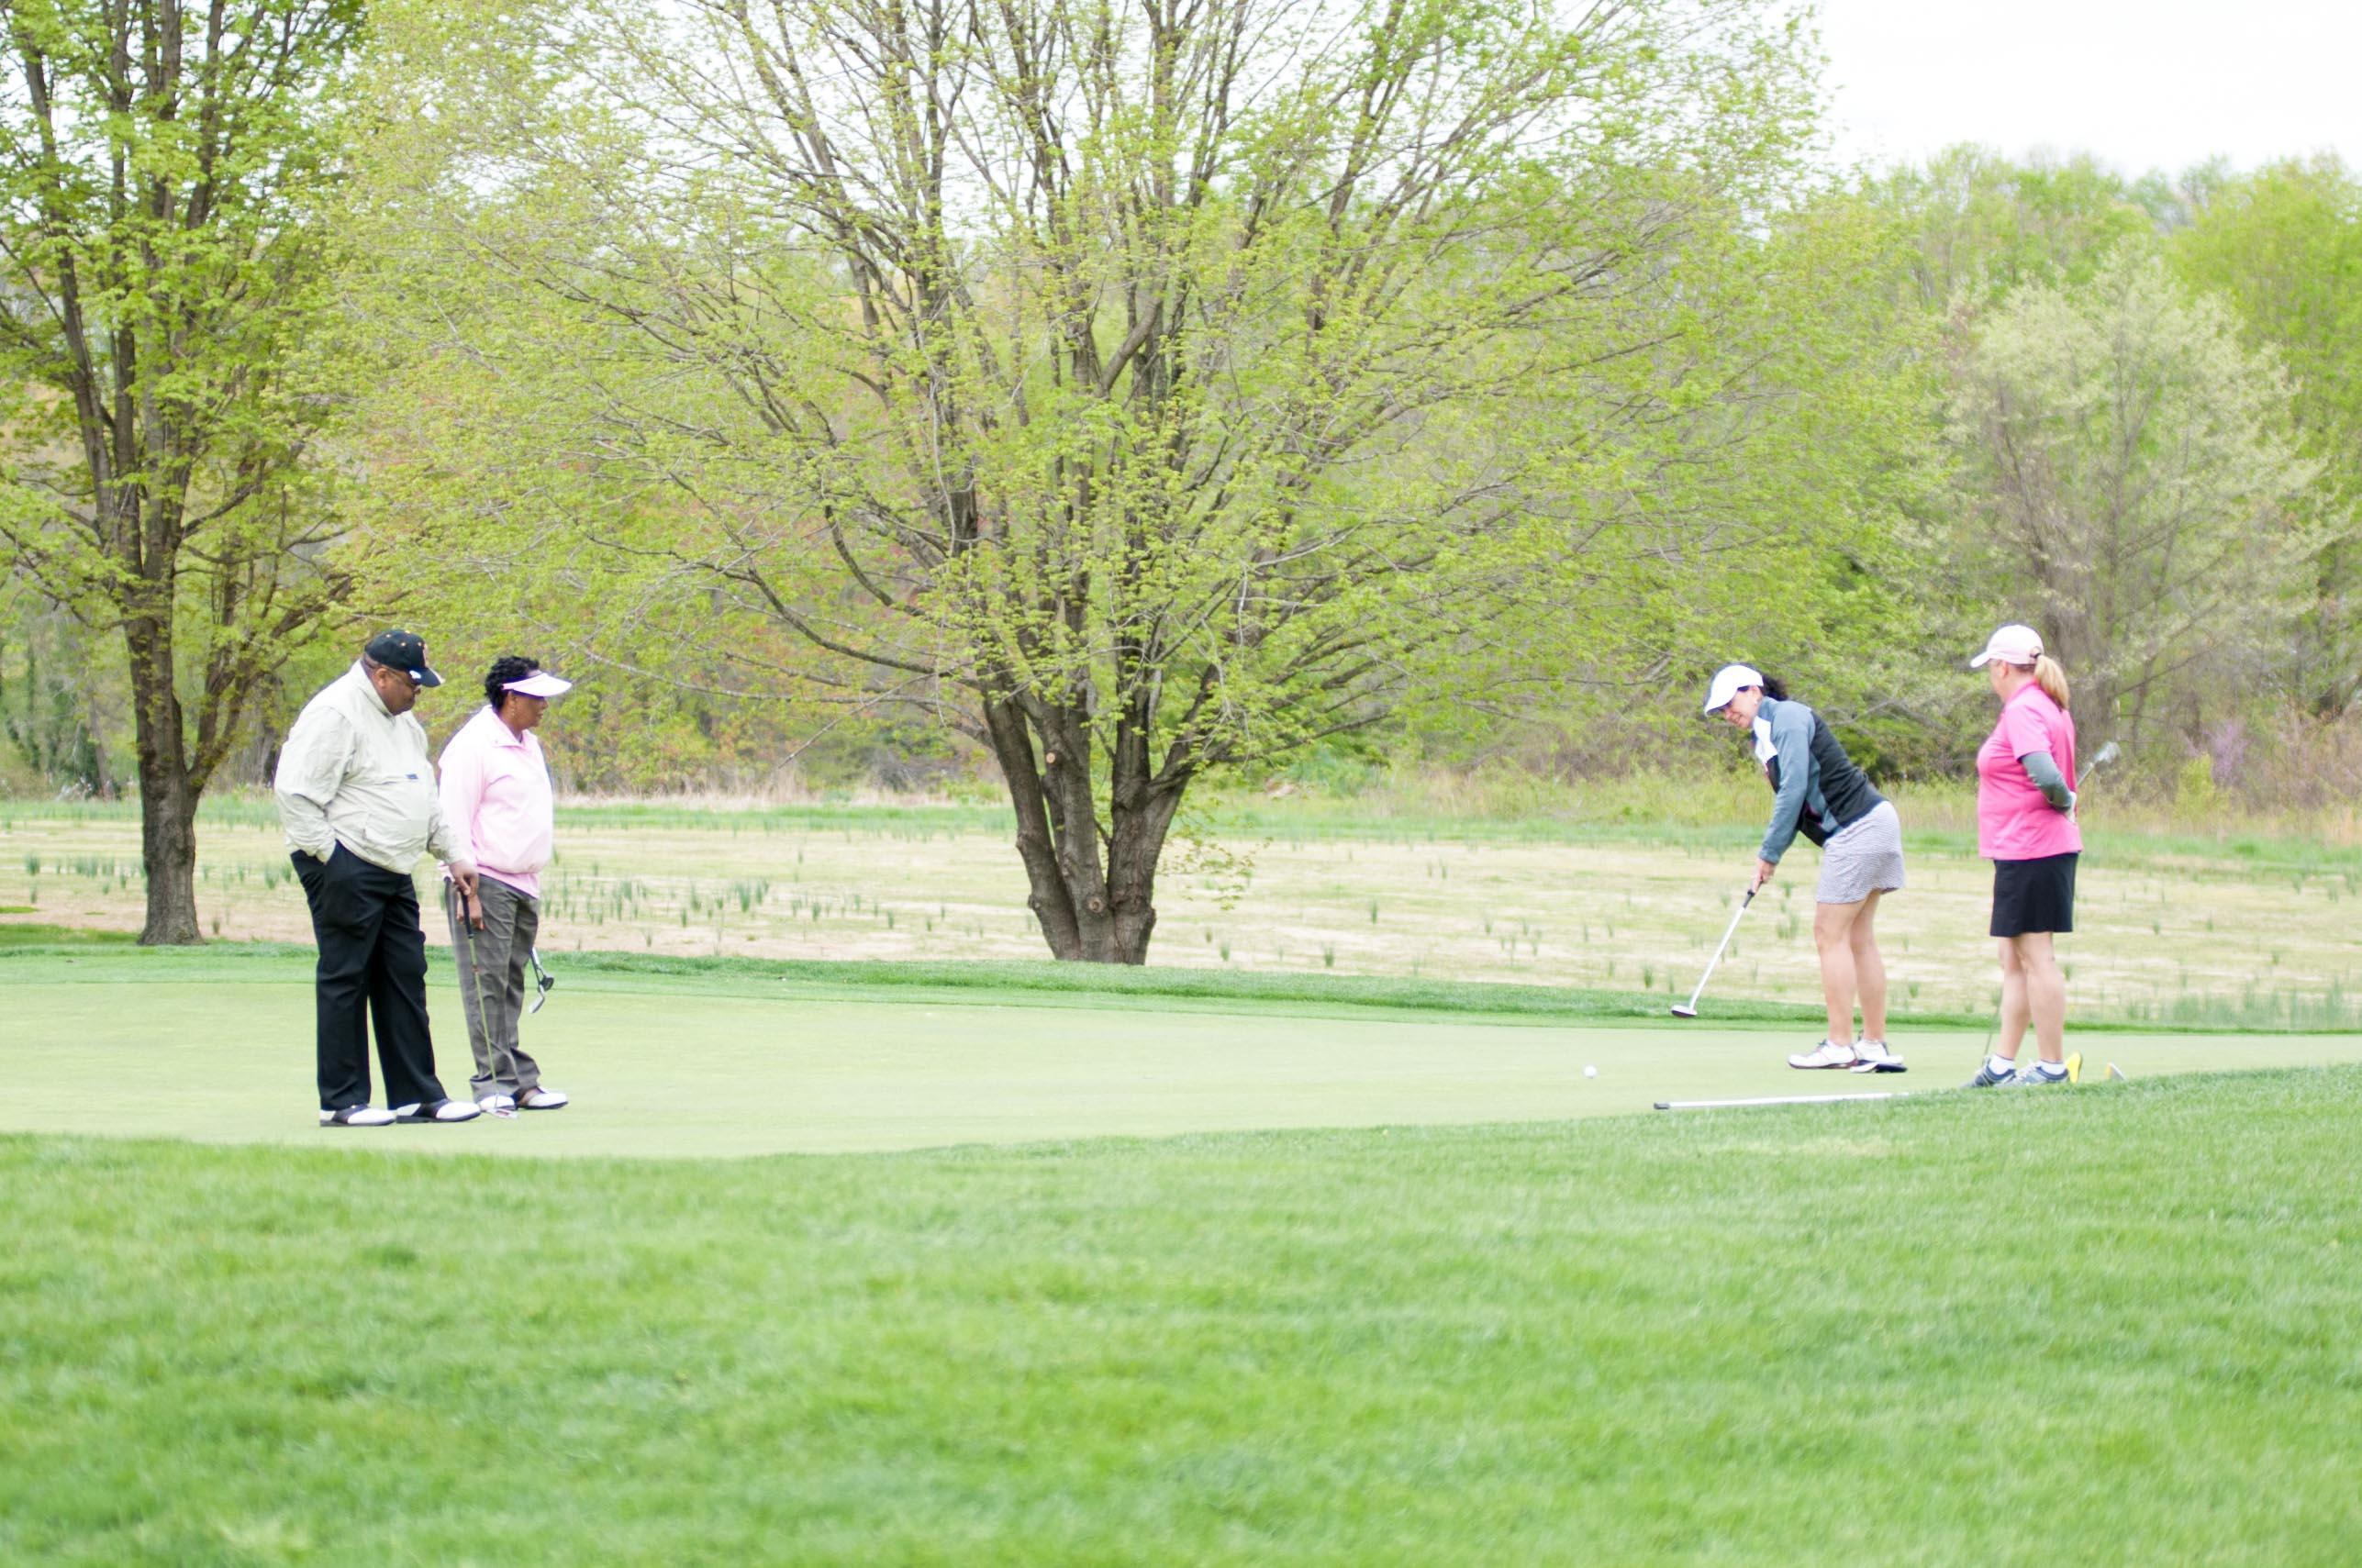 2018 Ivy Vine Charities, Inc. (IVC) - 12th Annual Benefit Golf Tournament